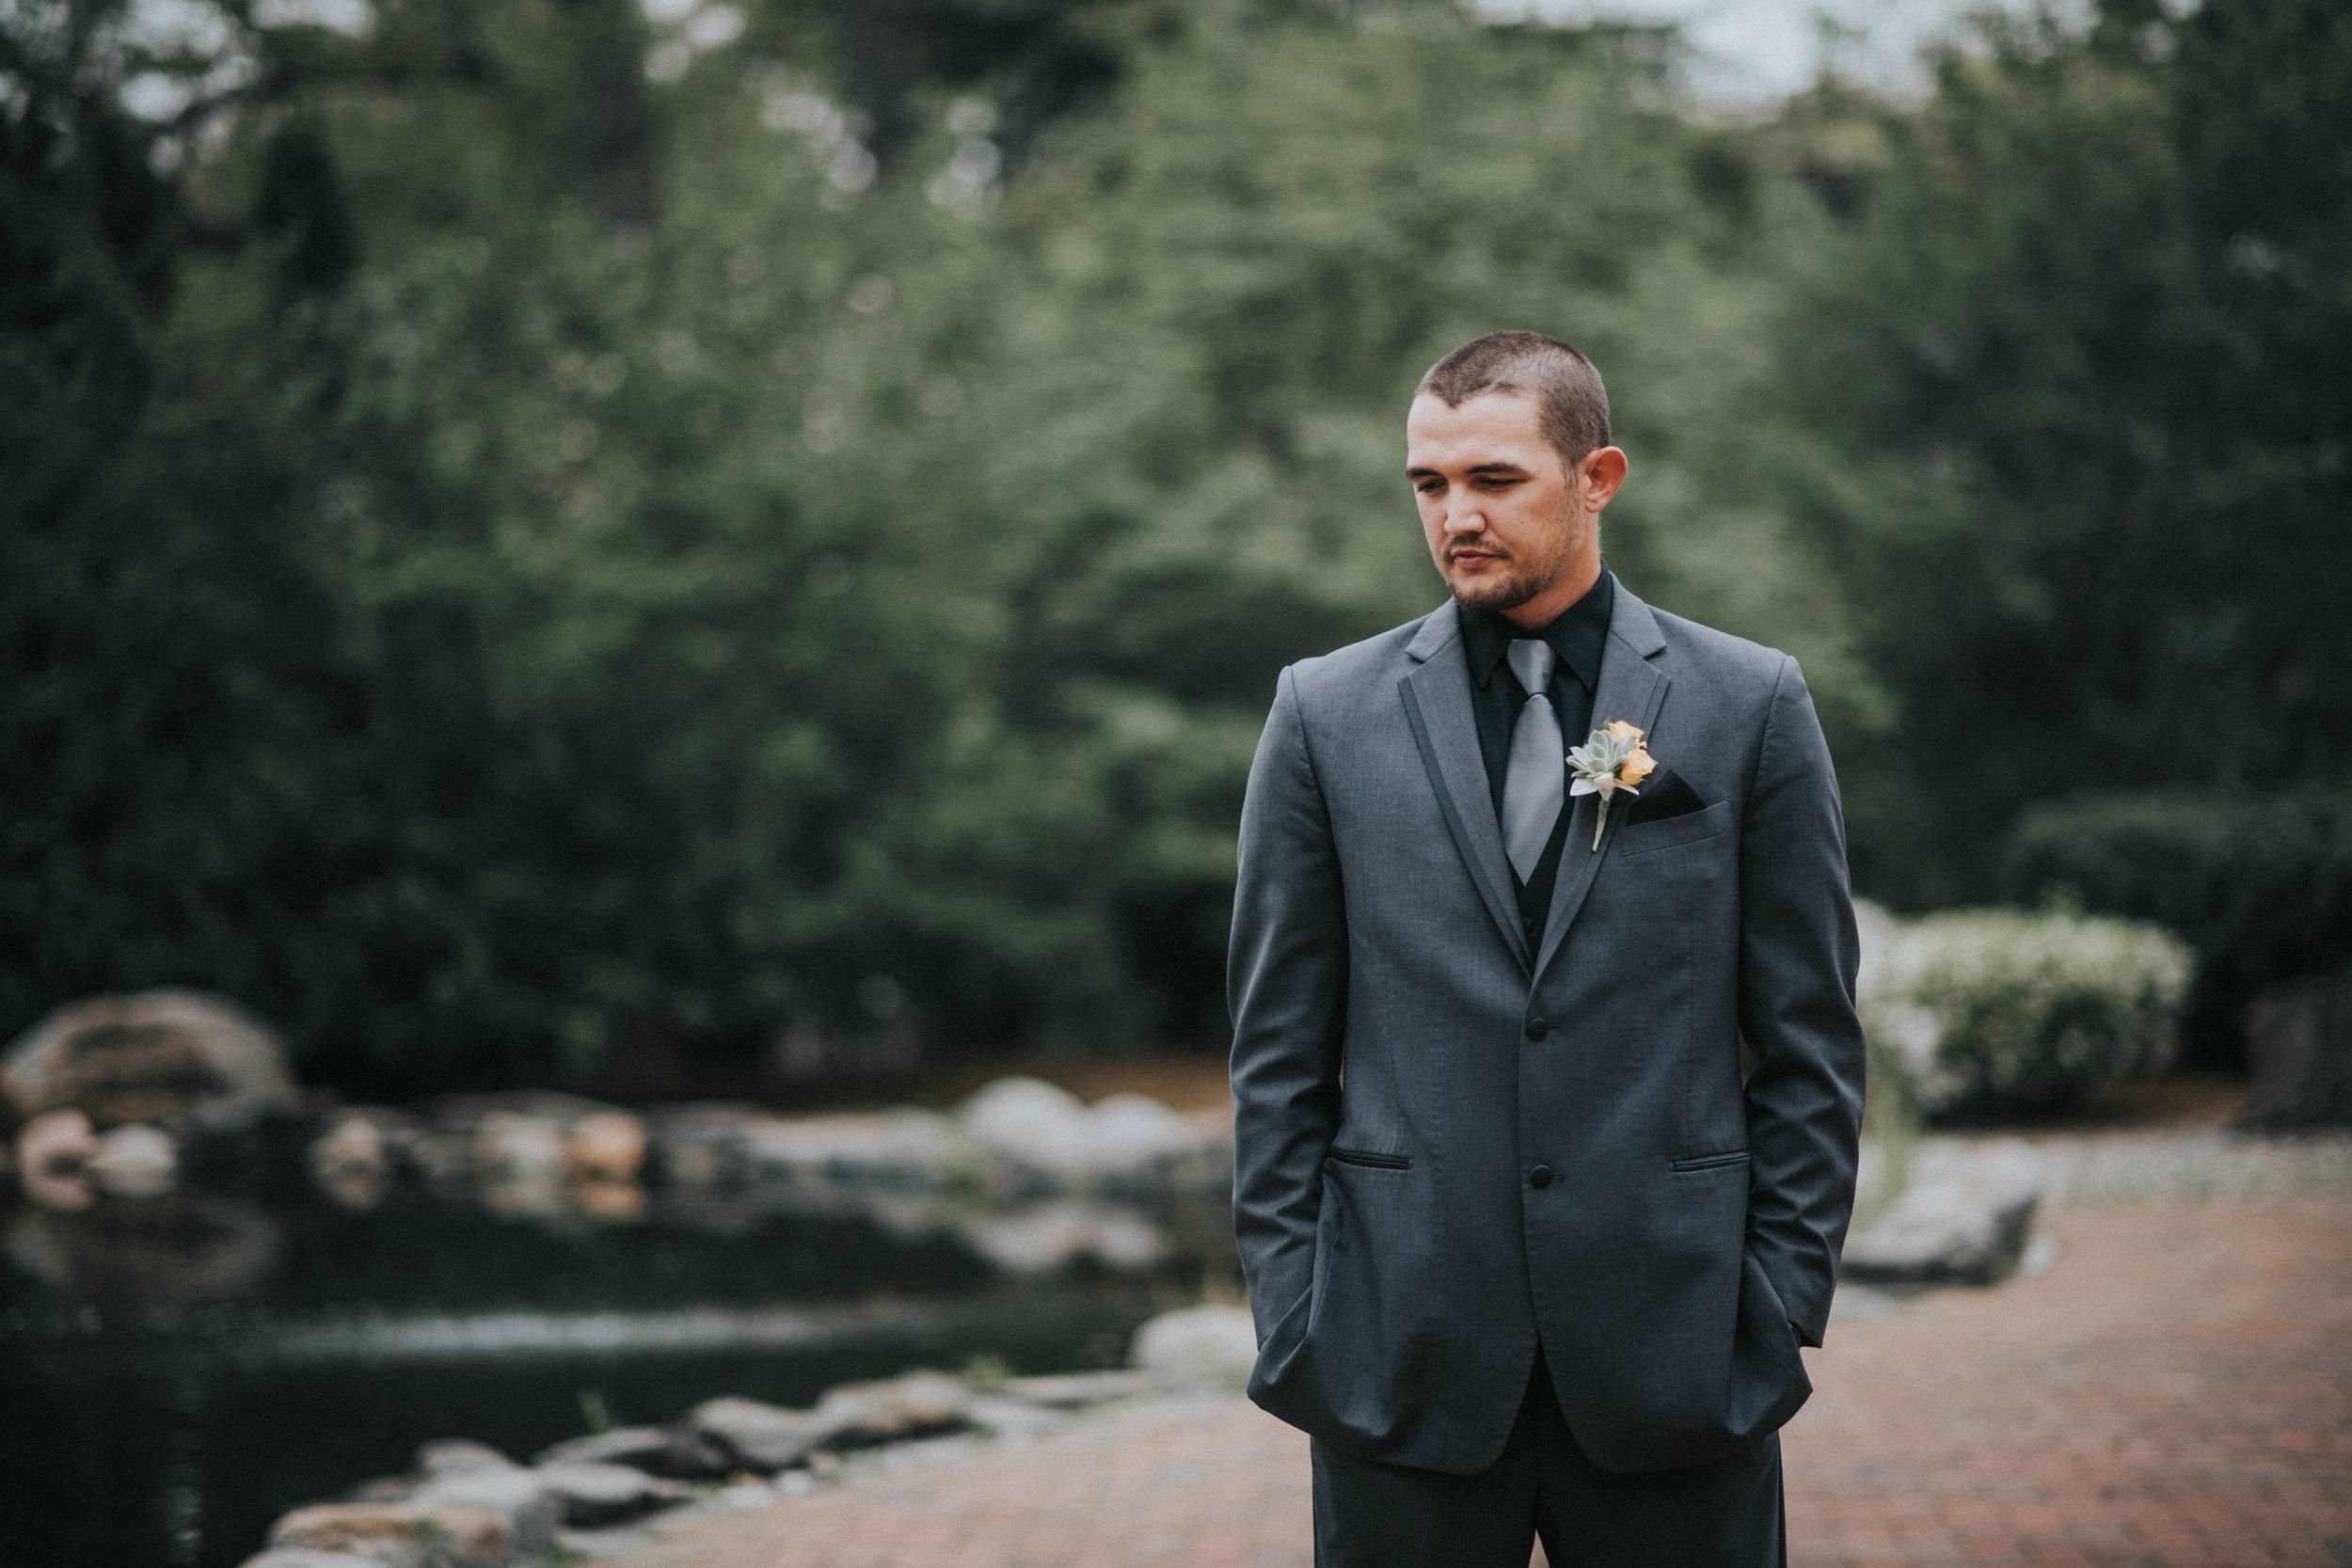 New-Jersey-Wedding-Photographer-Megan&Nick-FirstLooks-35.jpg